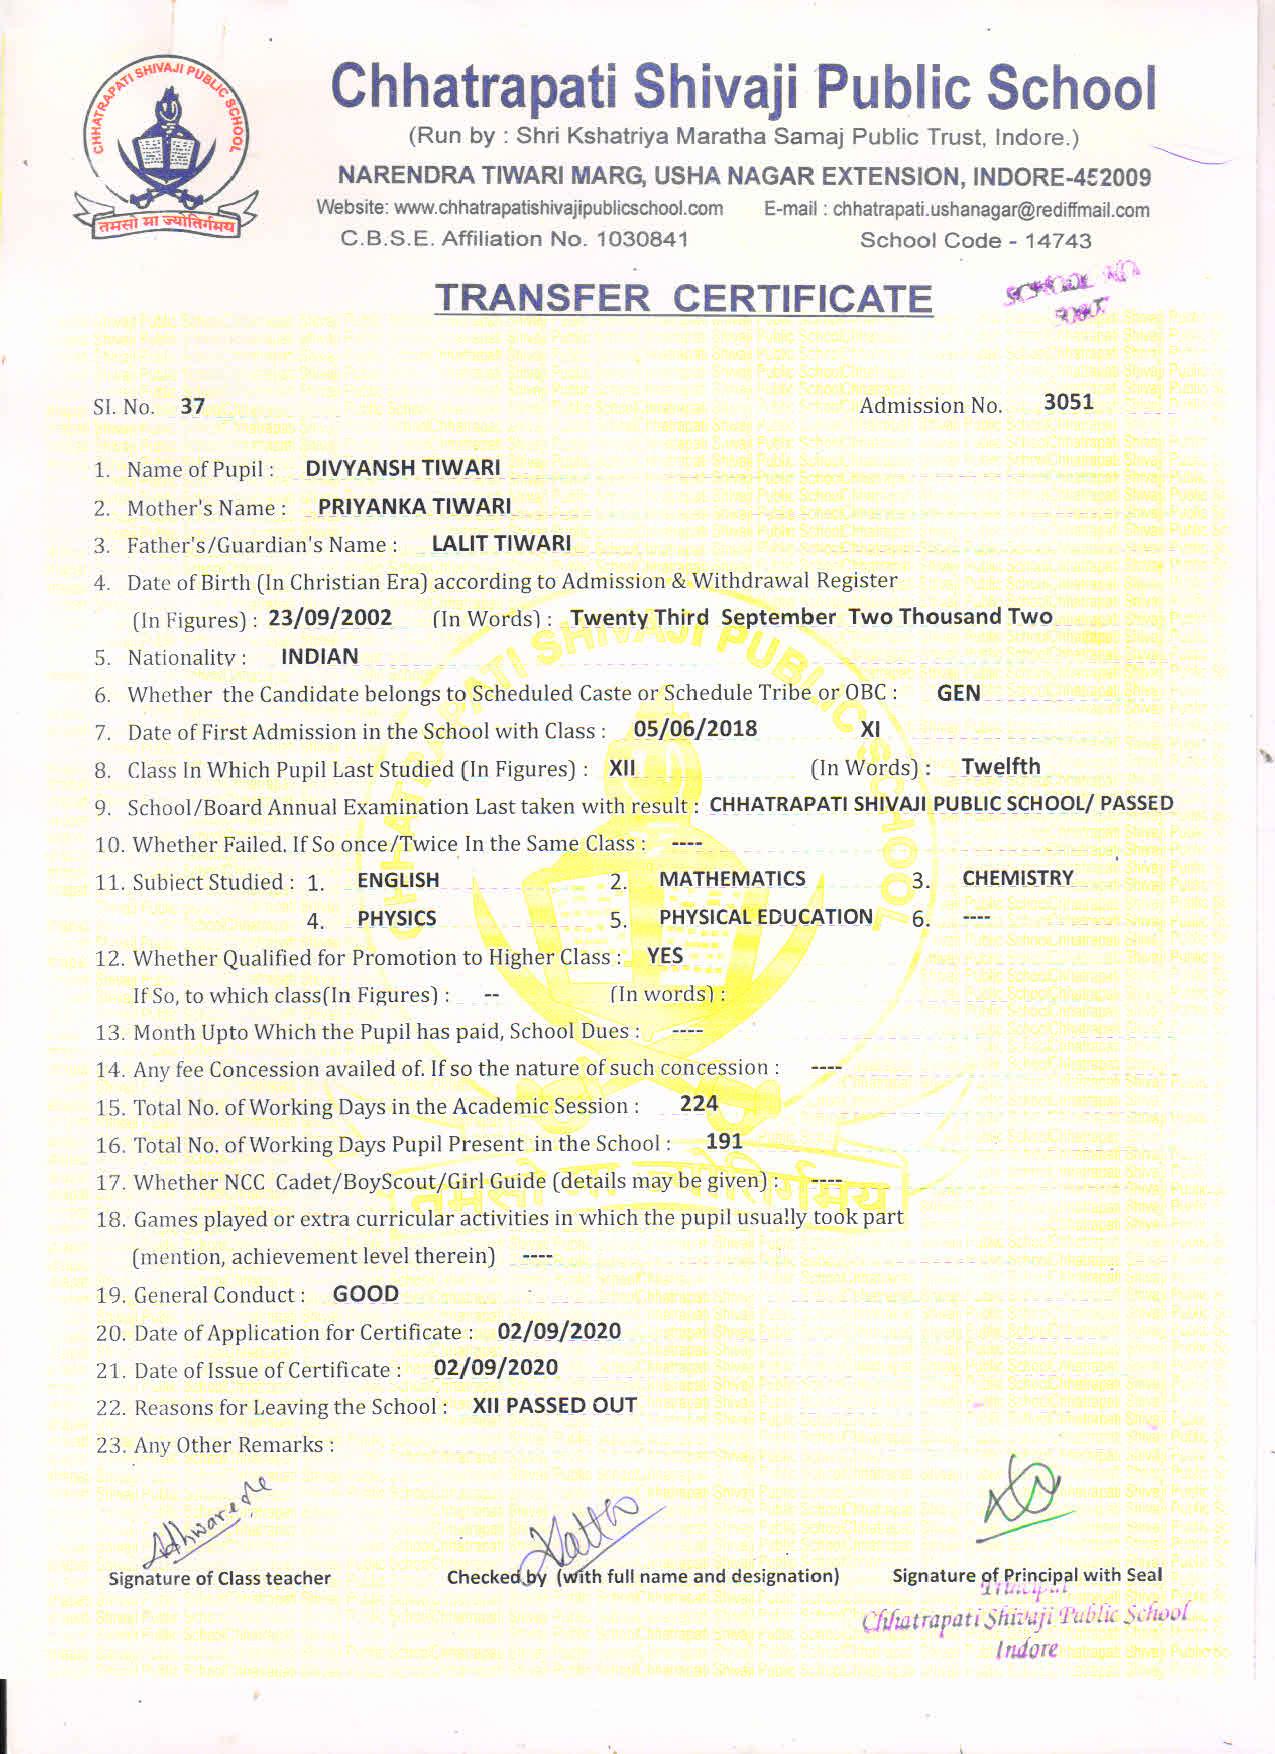 Divyansh Tiwari (TC)